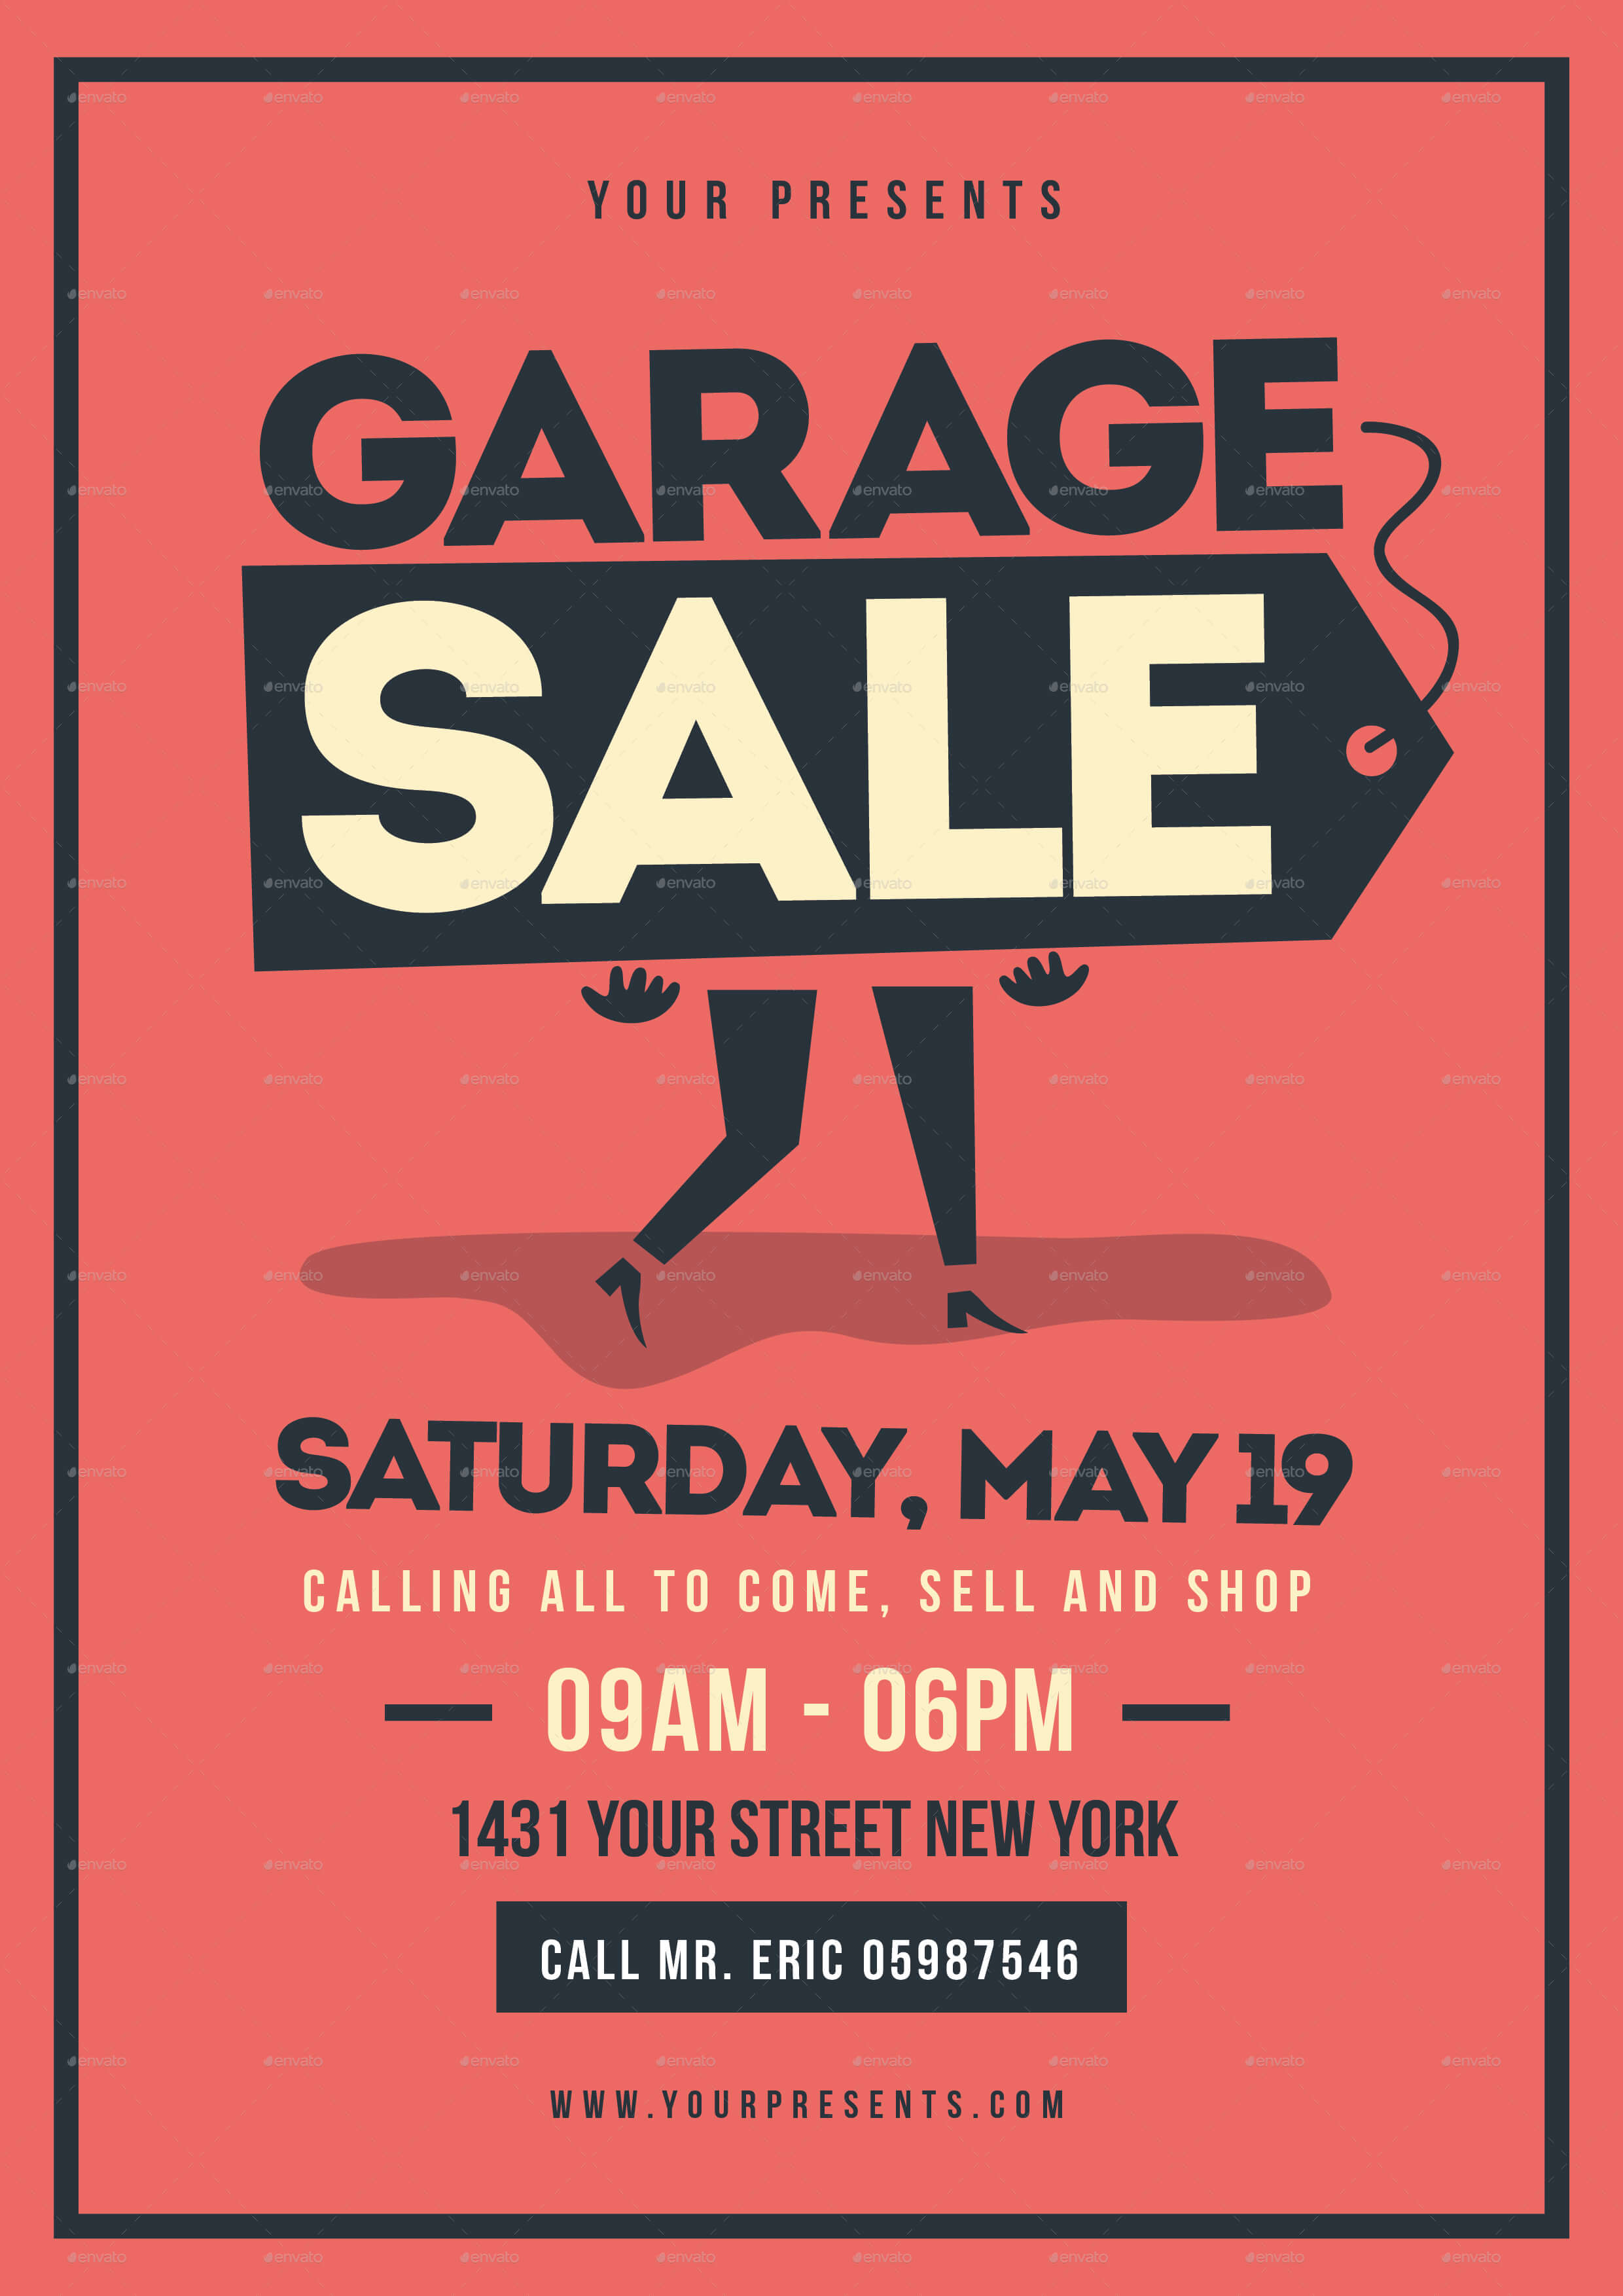 Retro Garage Sale Flyer In Yard Sale Flyer Template Word